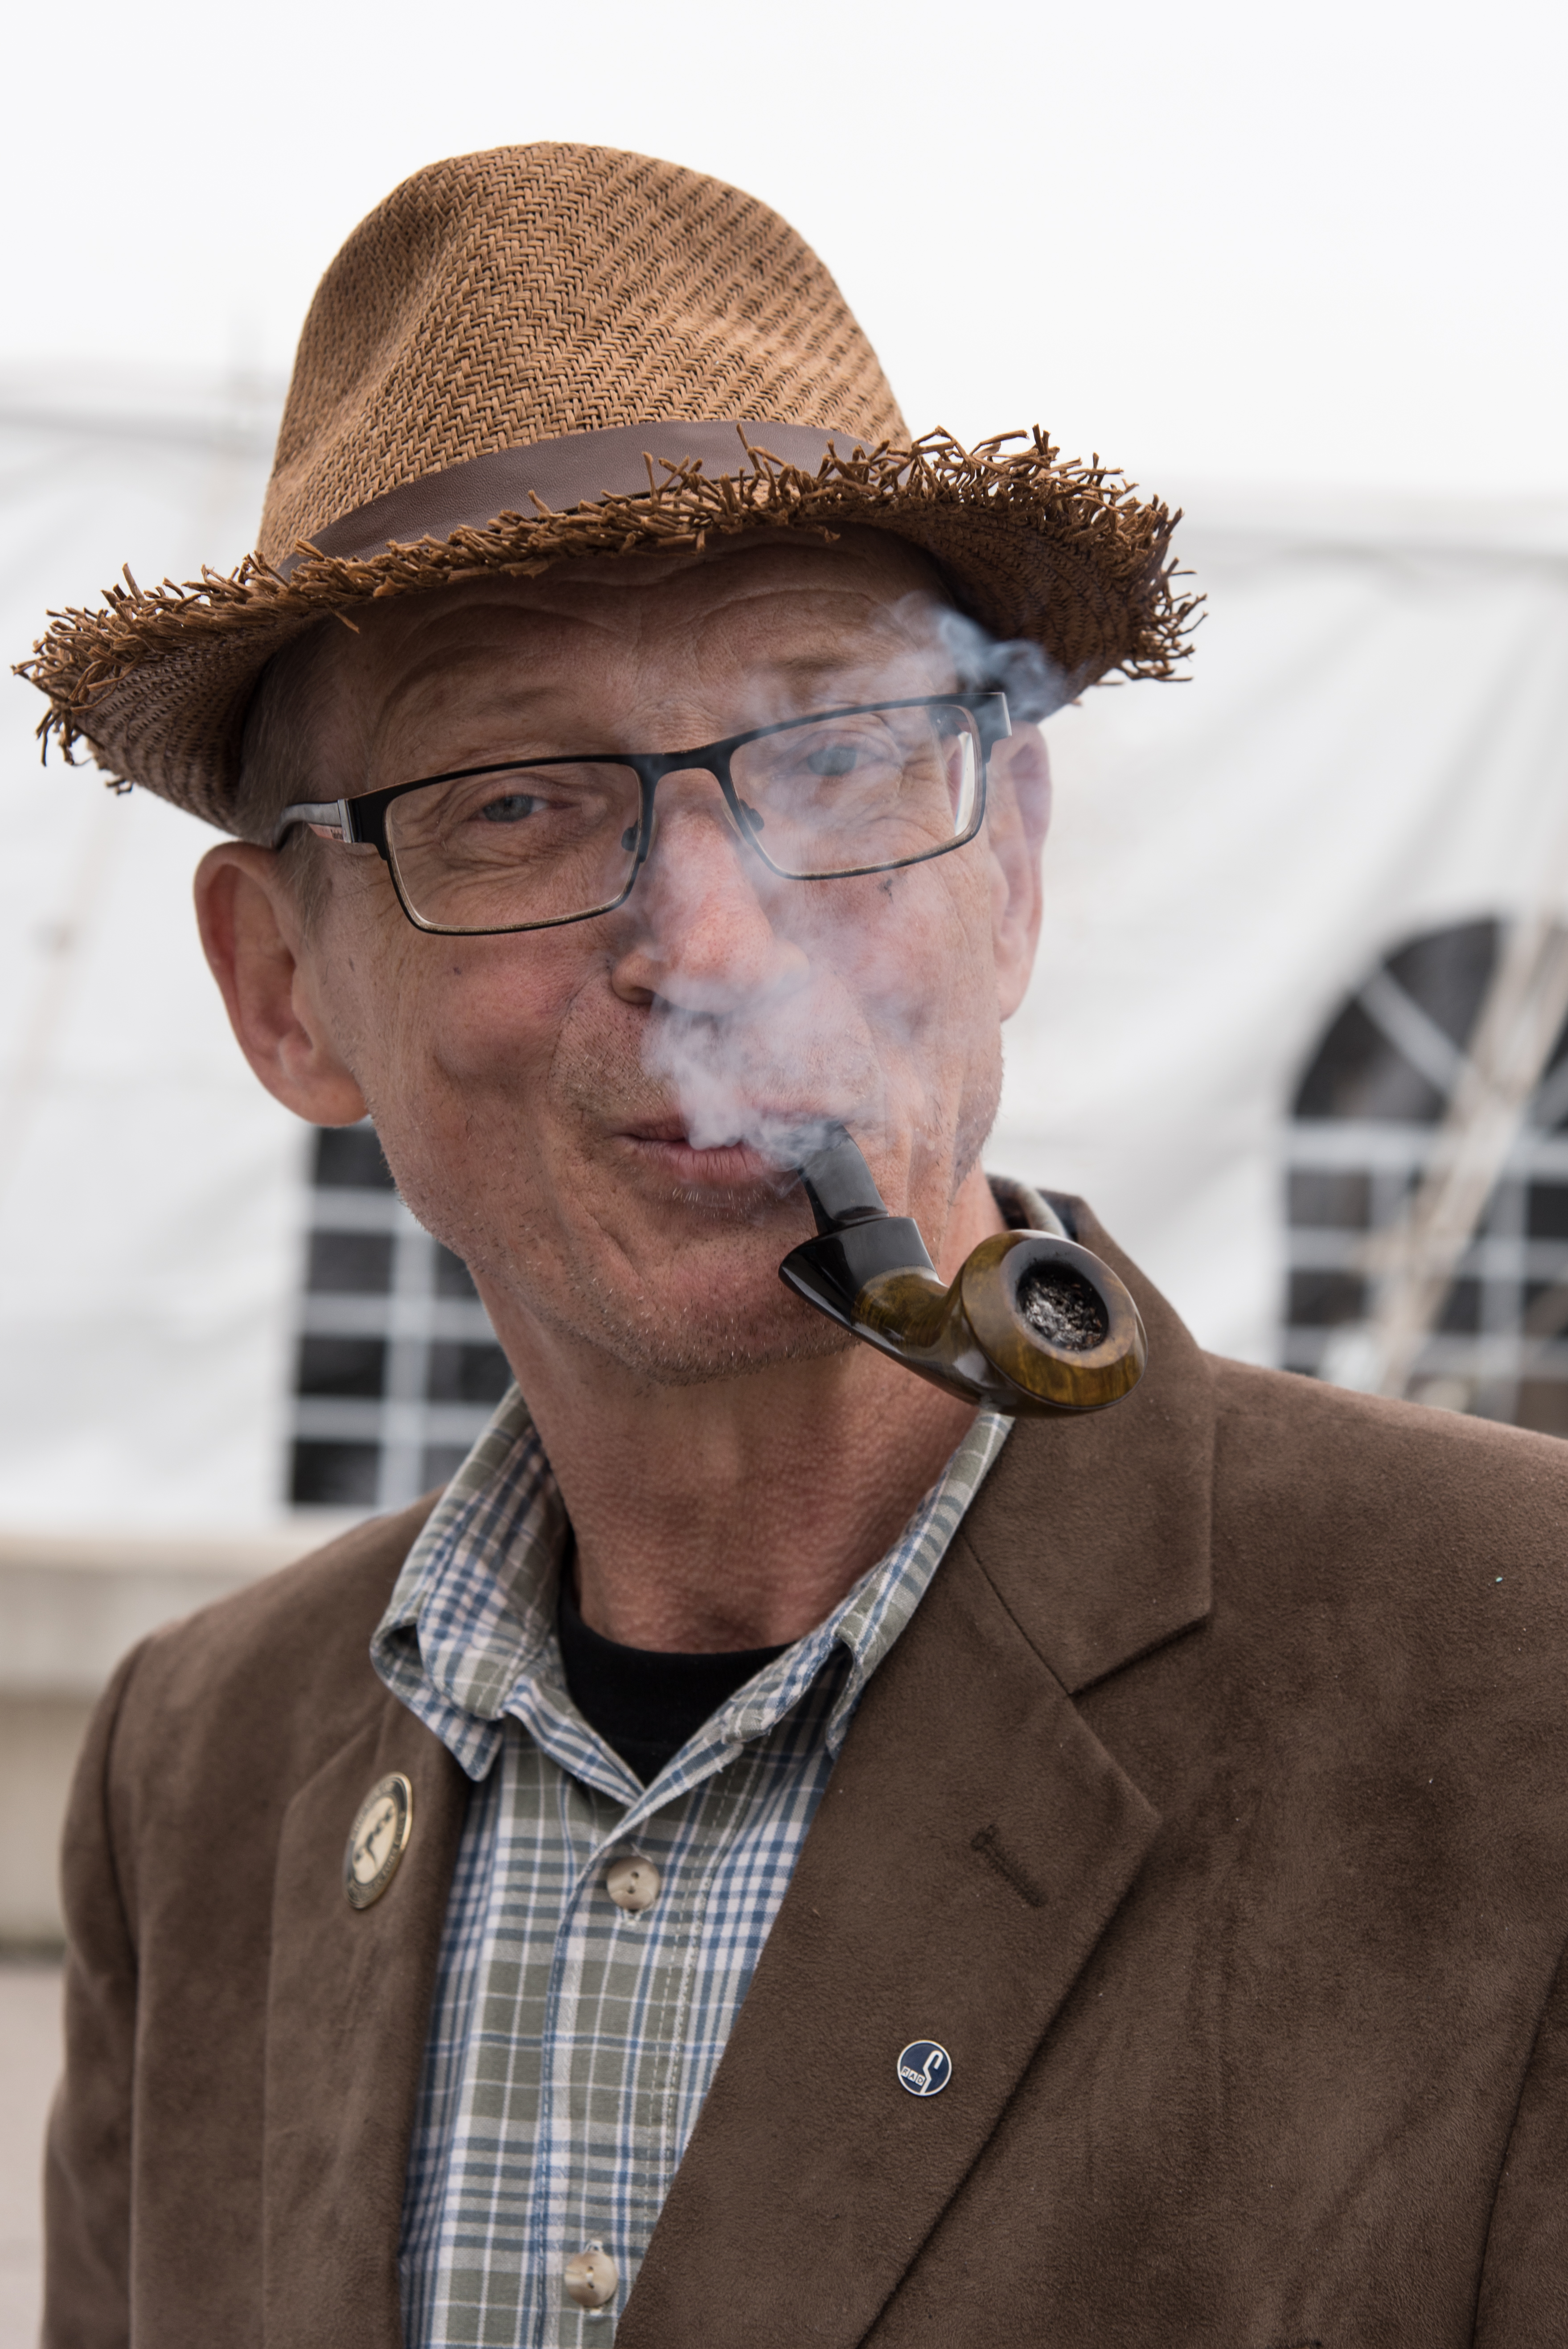 pipe dude 2